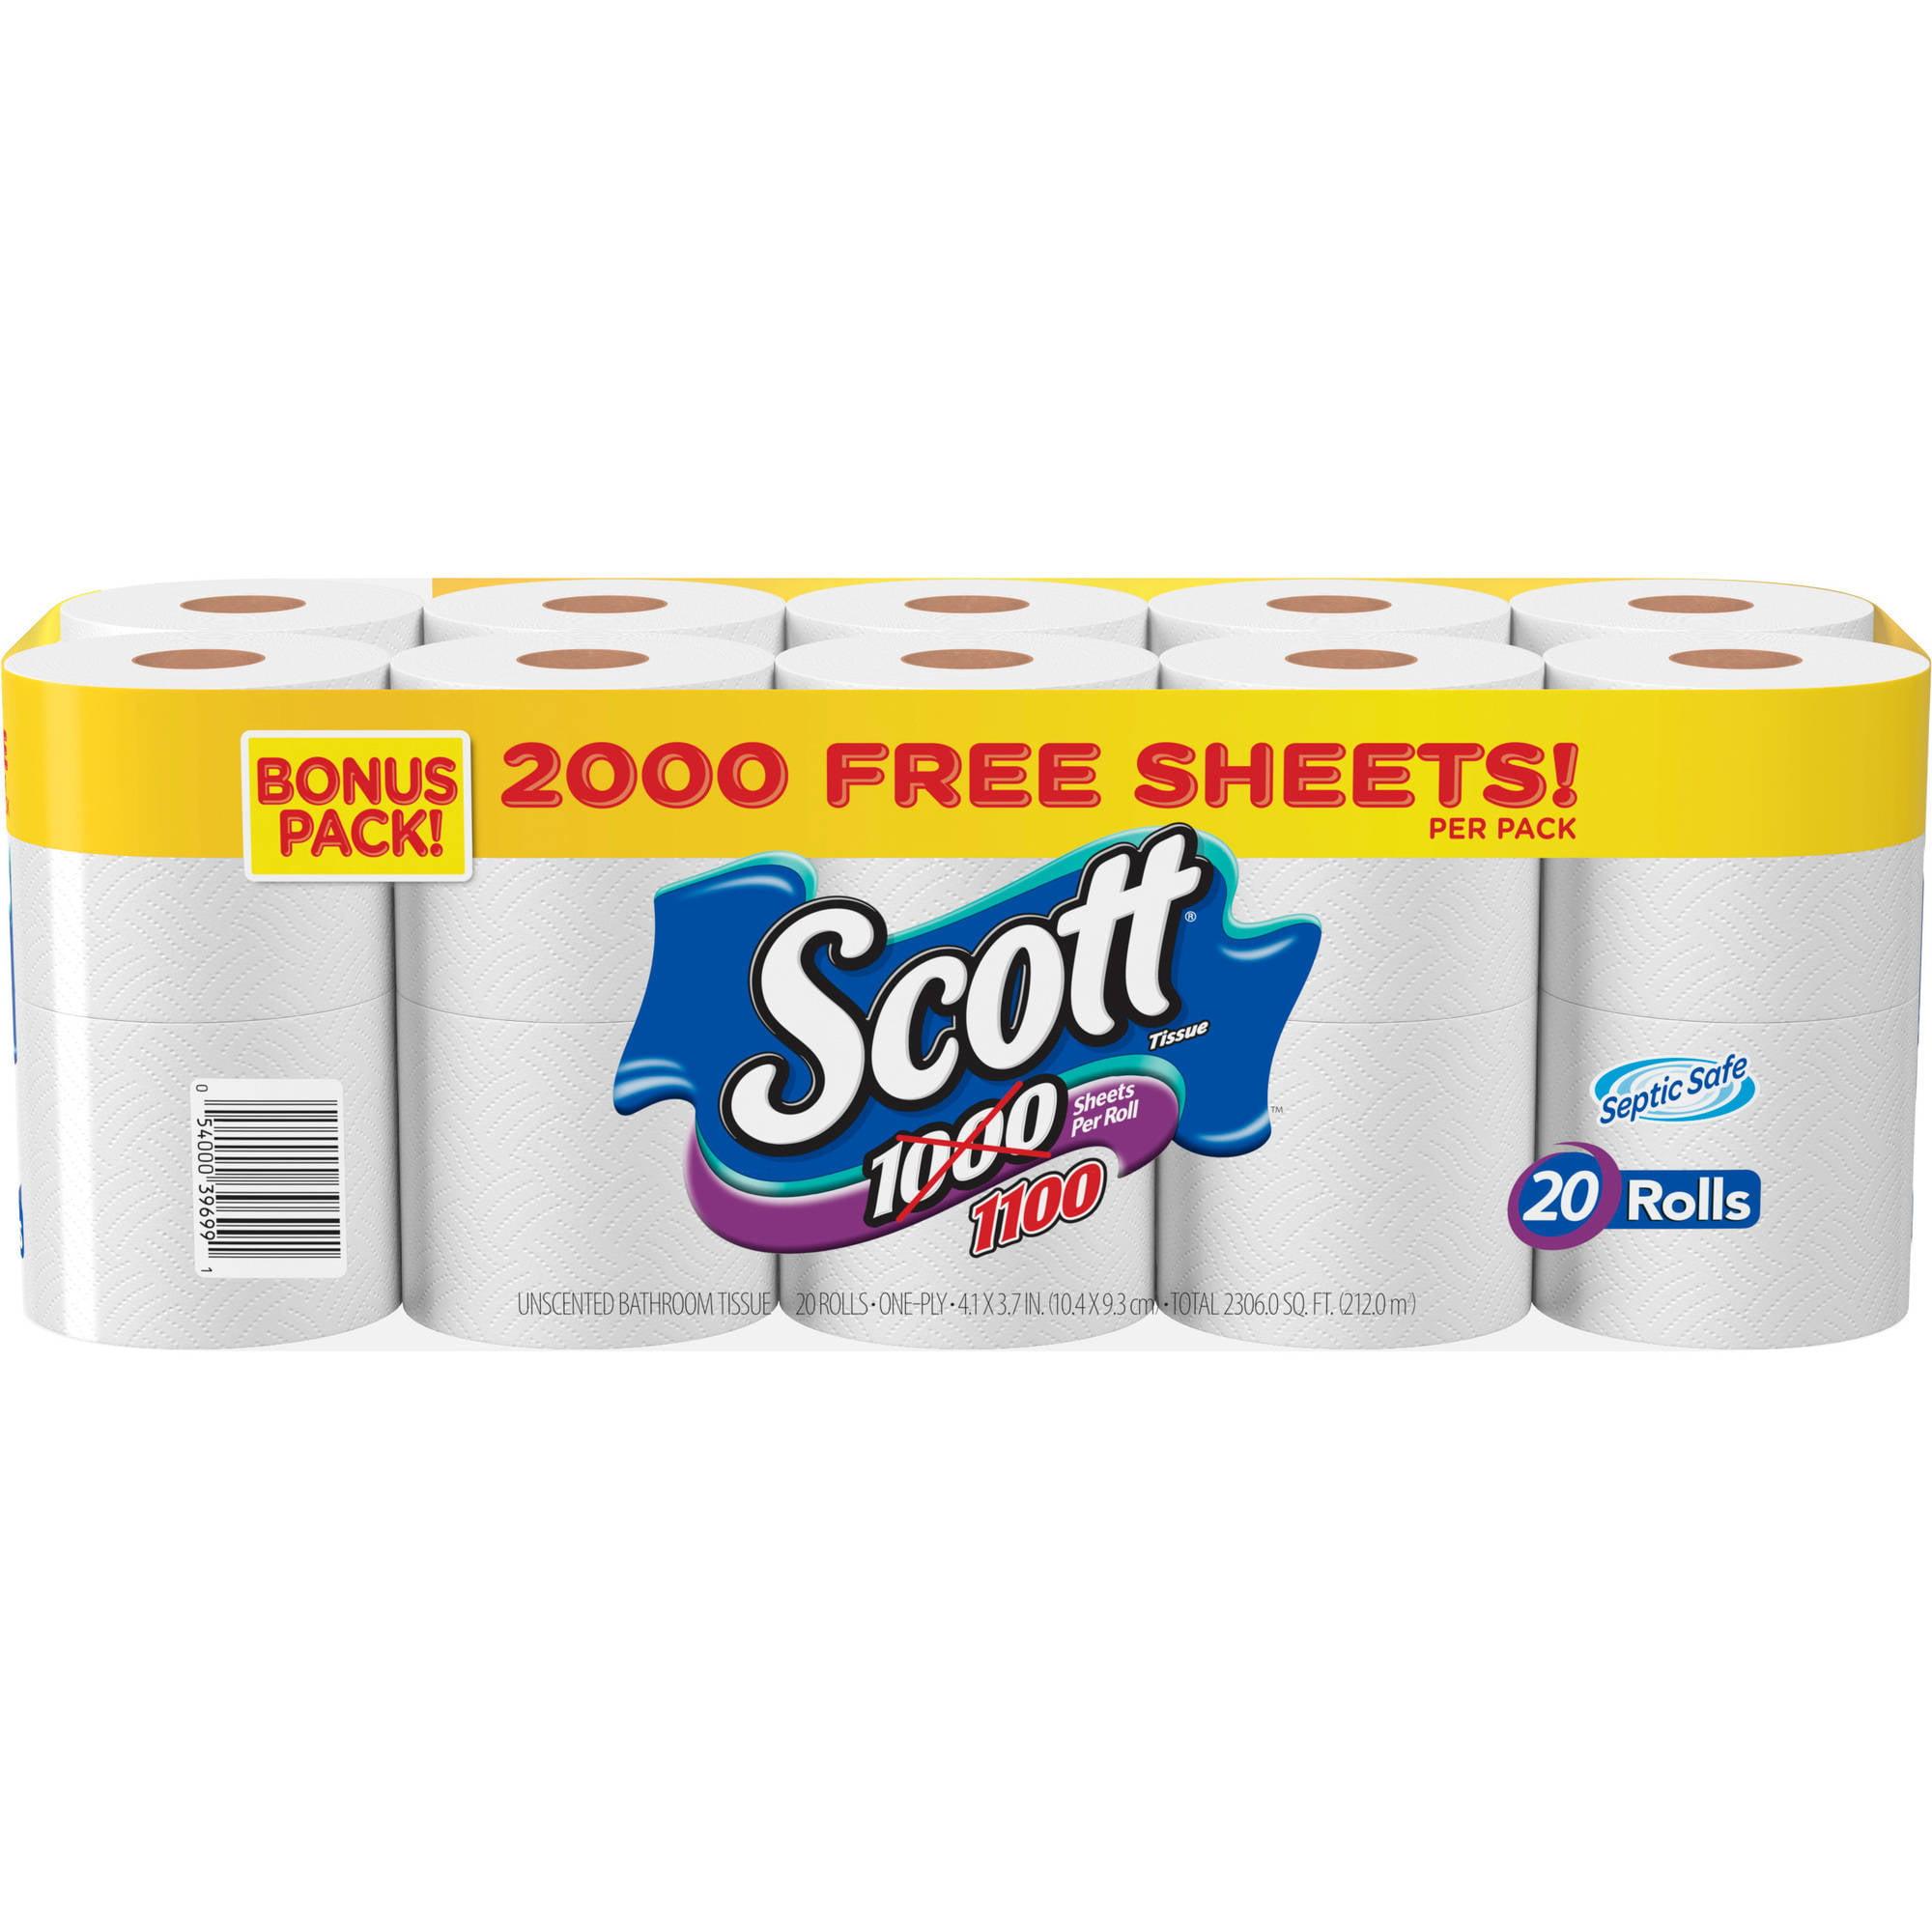 Scott Tissue 1100 Sheets Unscented Bathroom Tissue, 1100 sheets, 20 rolls